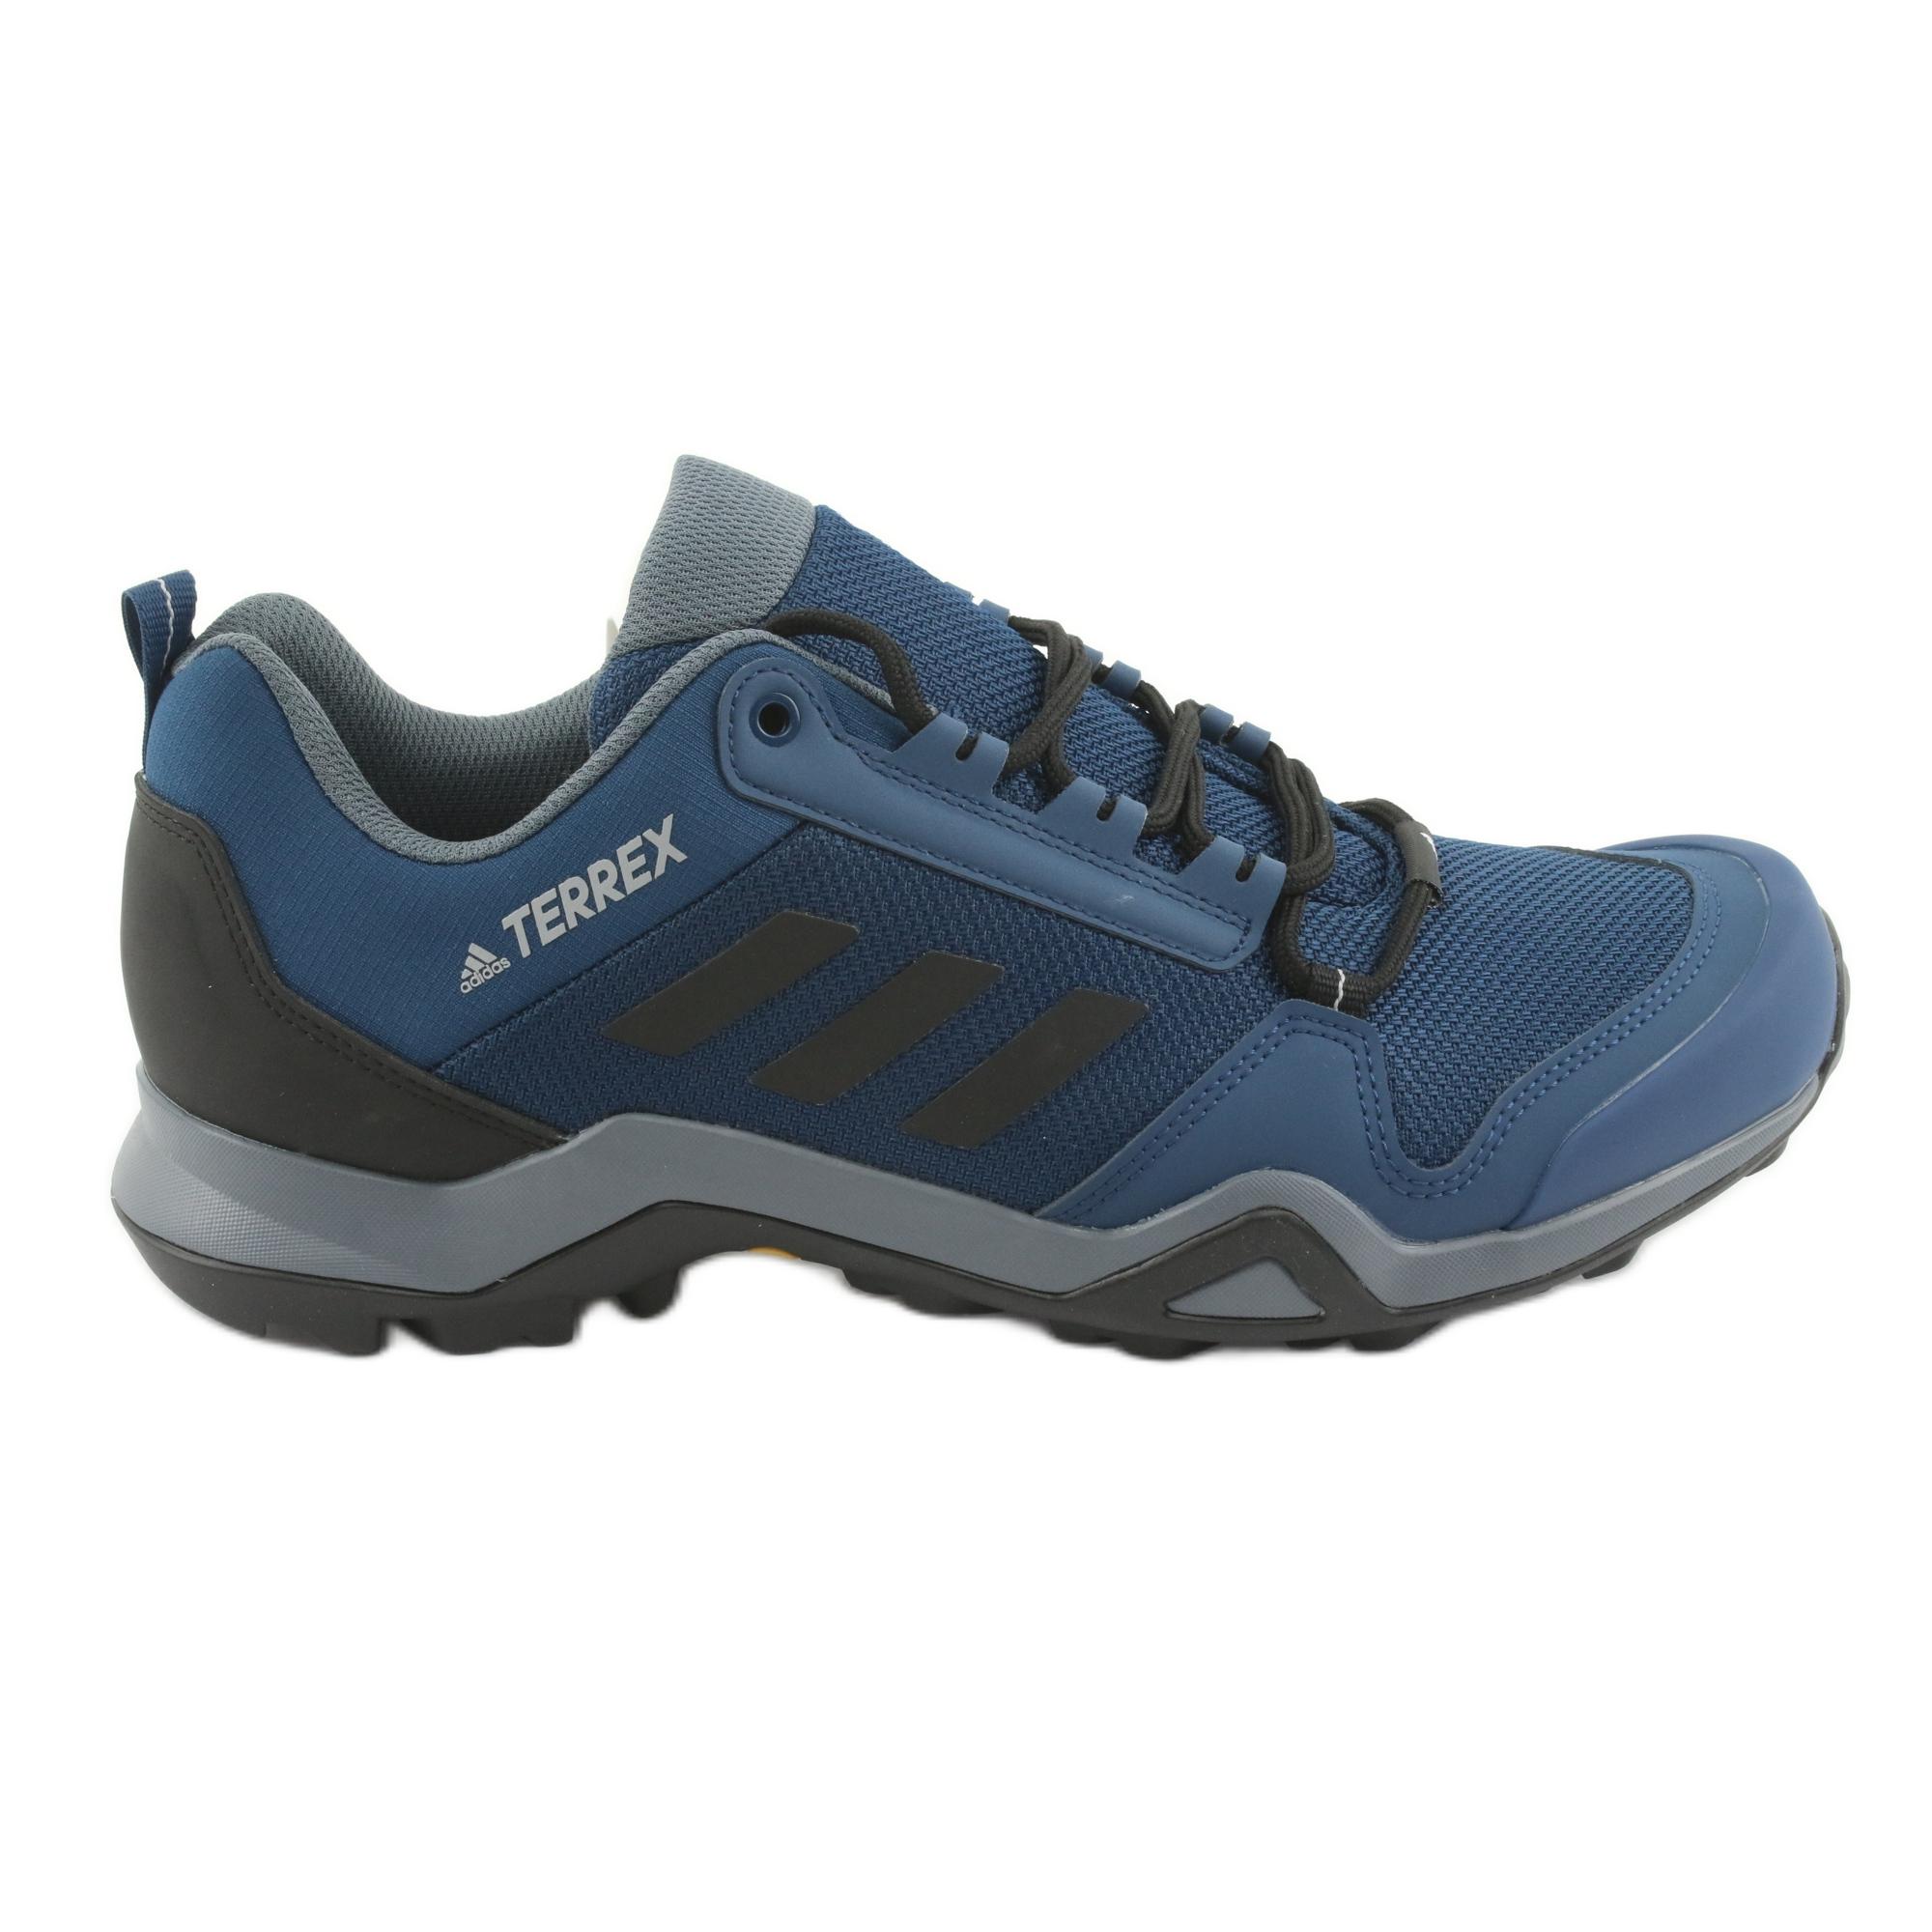 De Adidas Terrex M Ax3 Bc0527 Trekking Zapatillas 5ARLj4